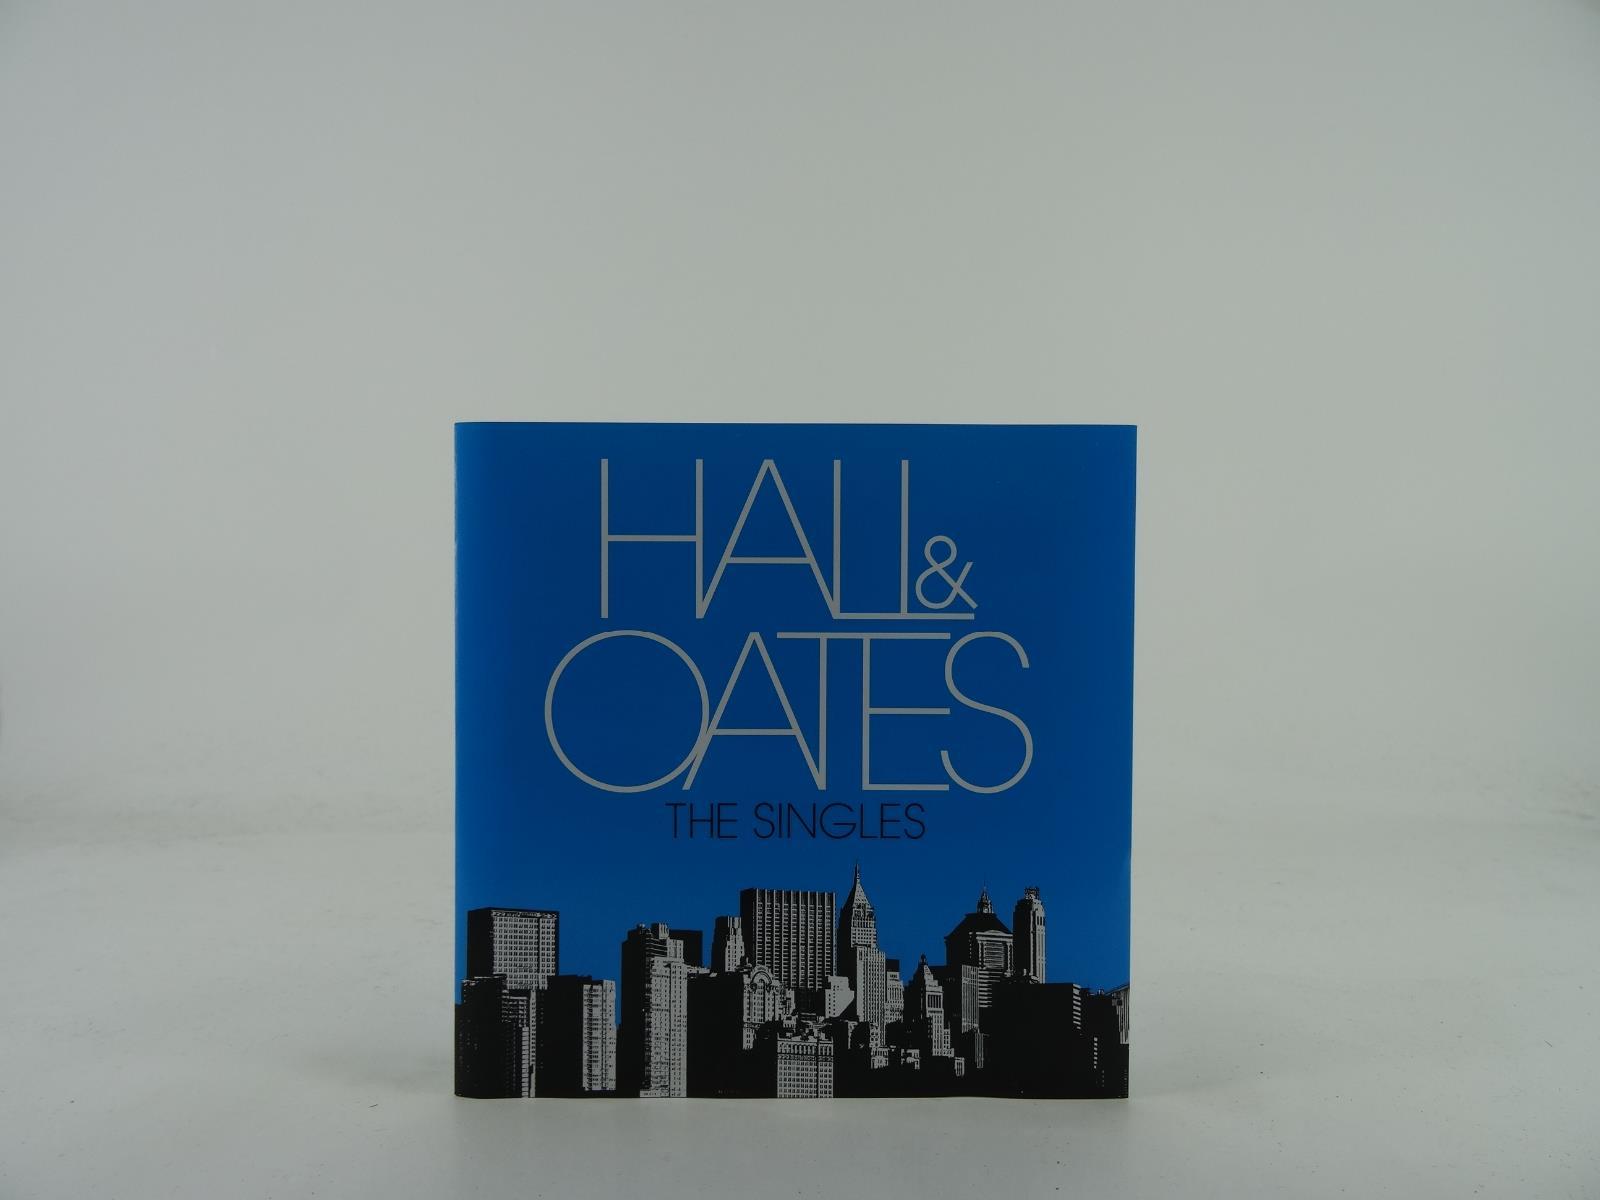 Hall and oates singles list